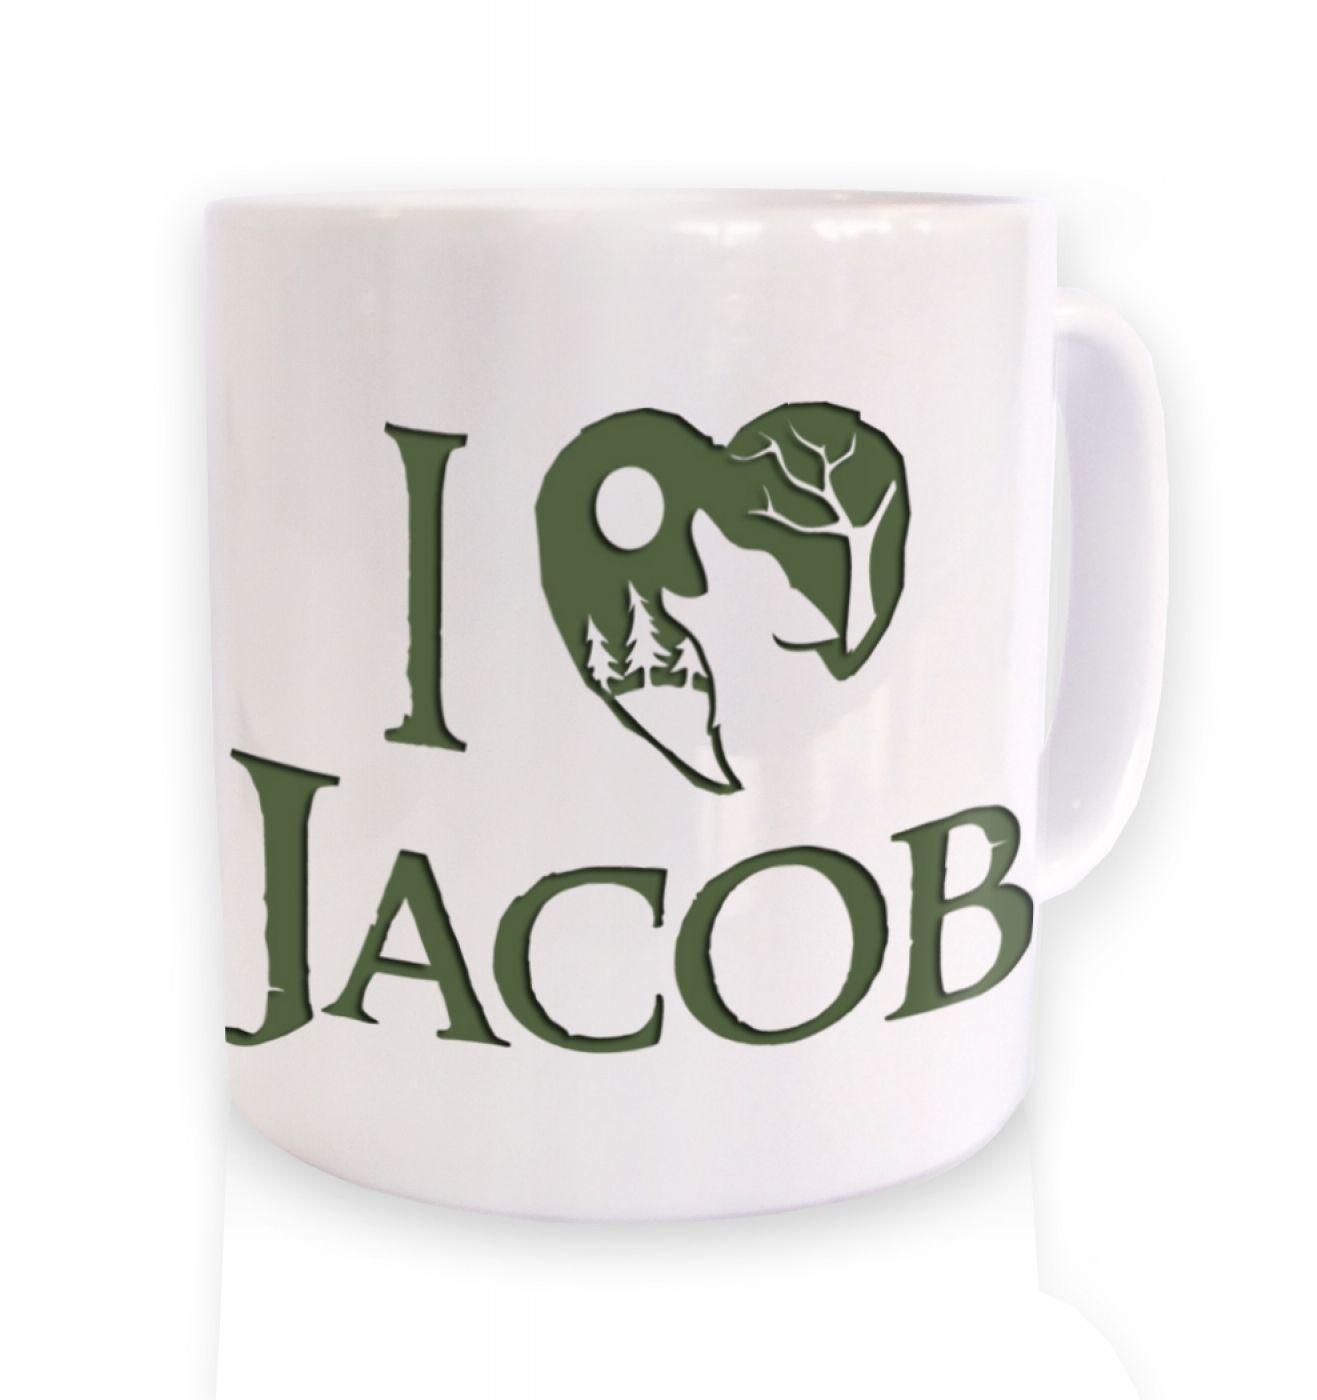 I Heart Jacob (green) ceramic coffee mug